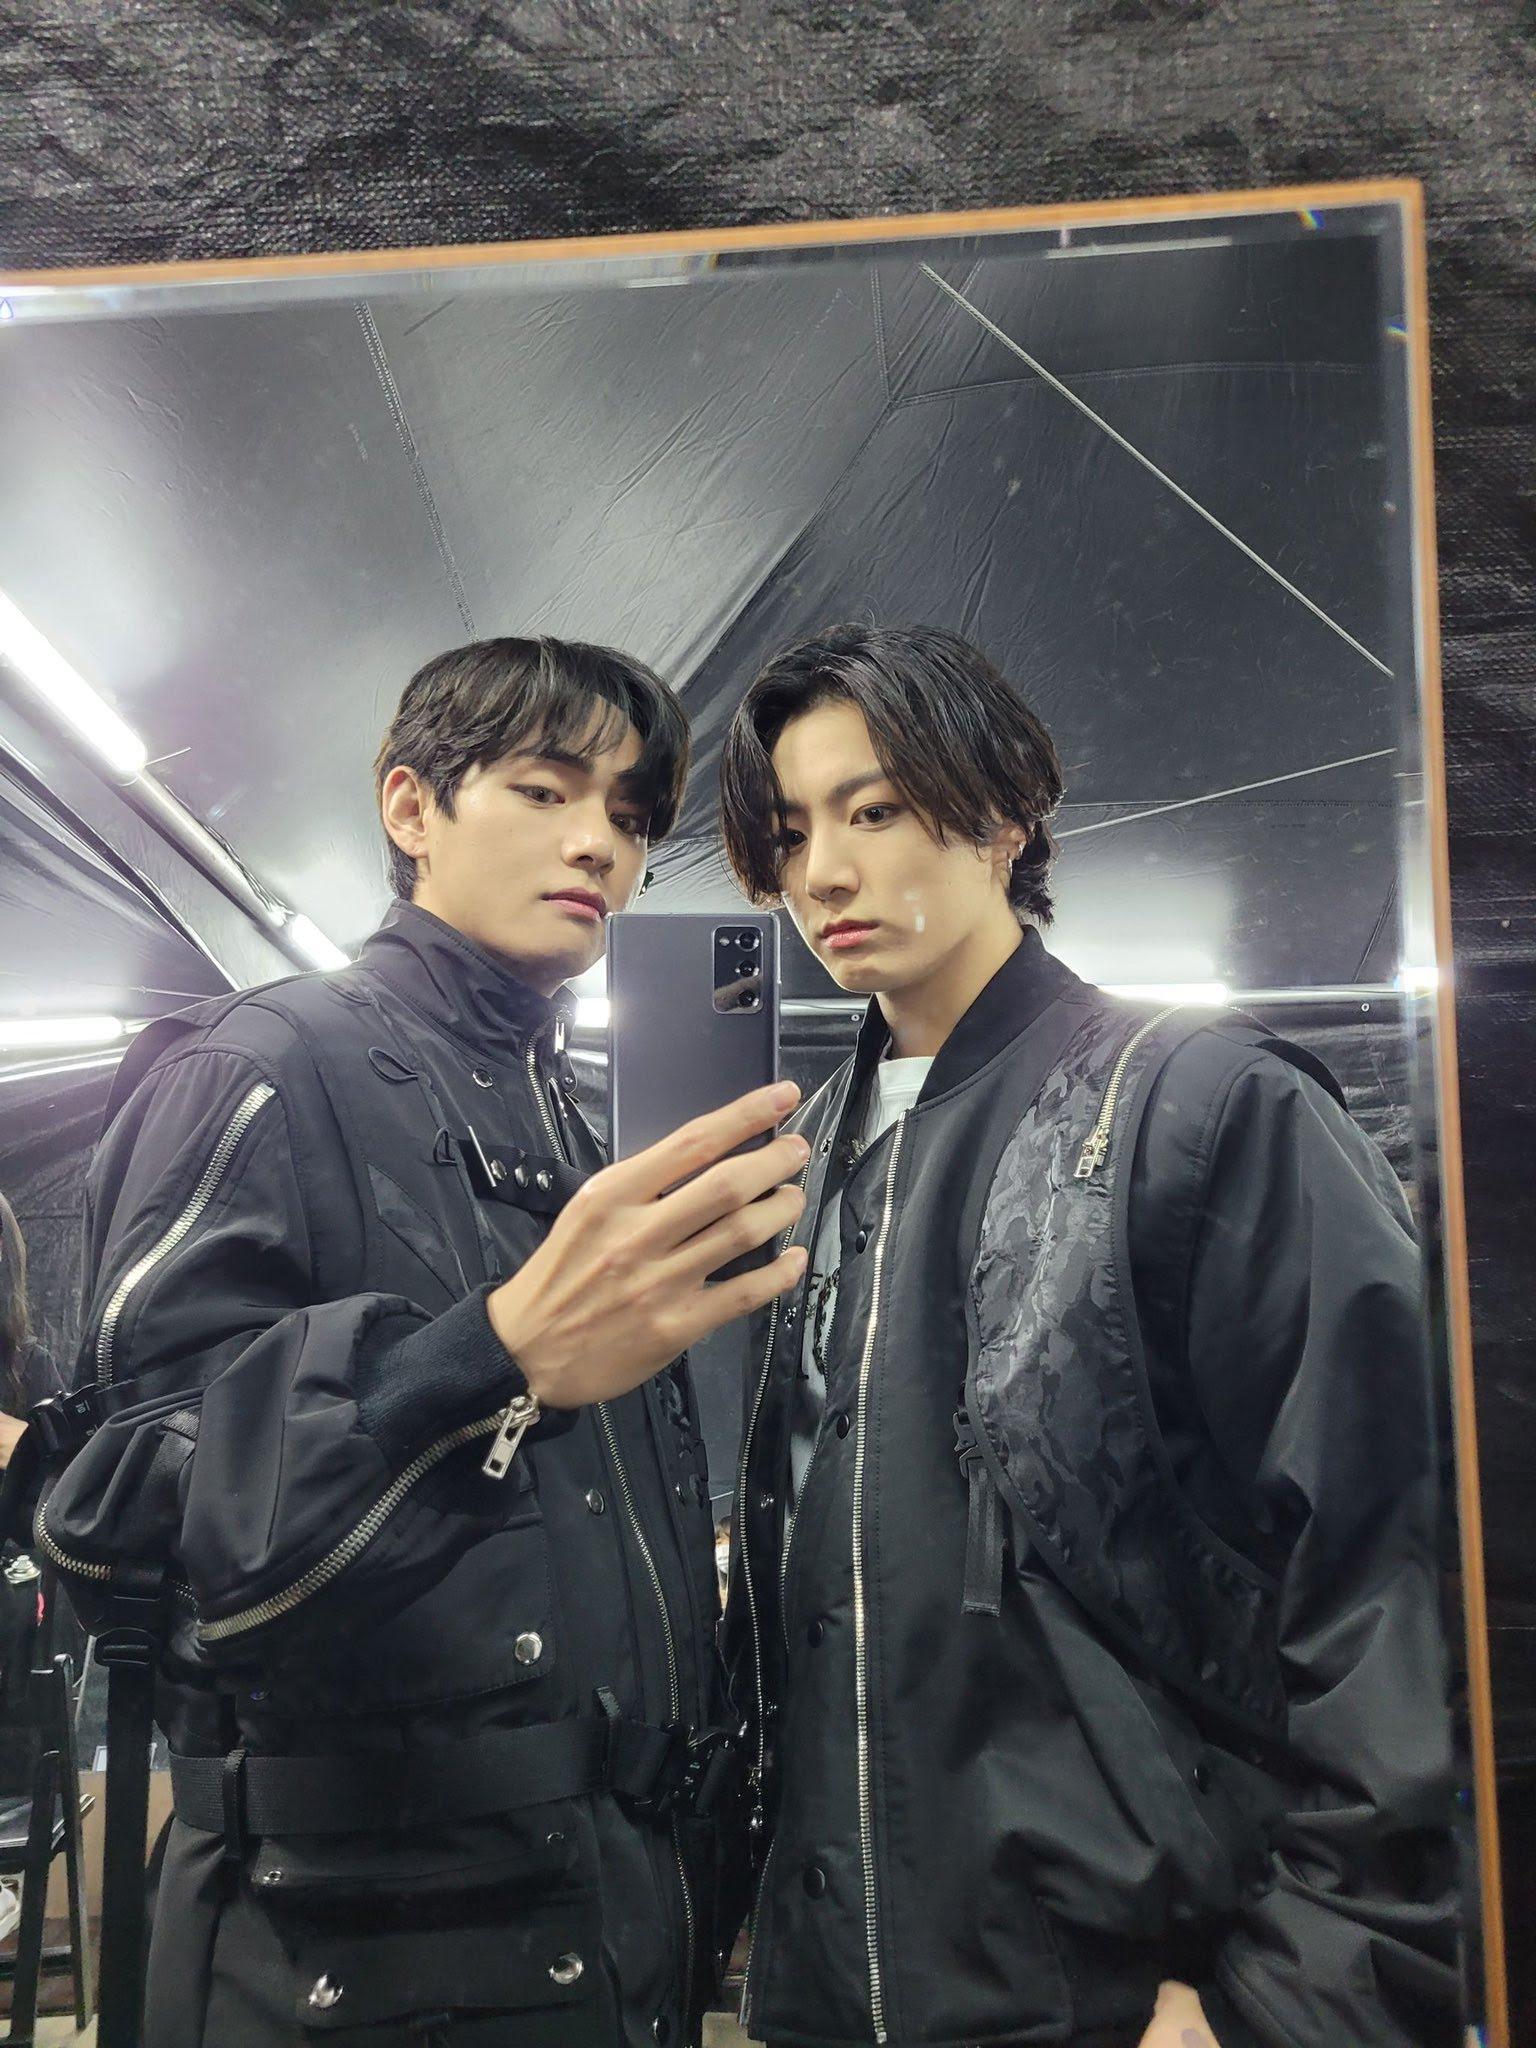 BTS's V (Left) & Jungkook (Right) | Weverse